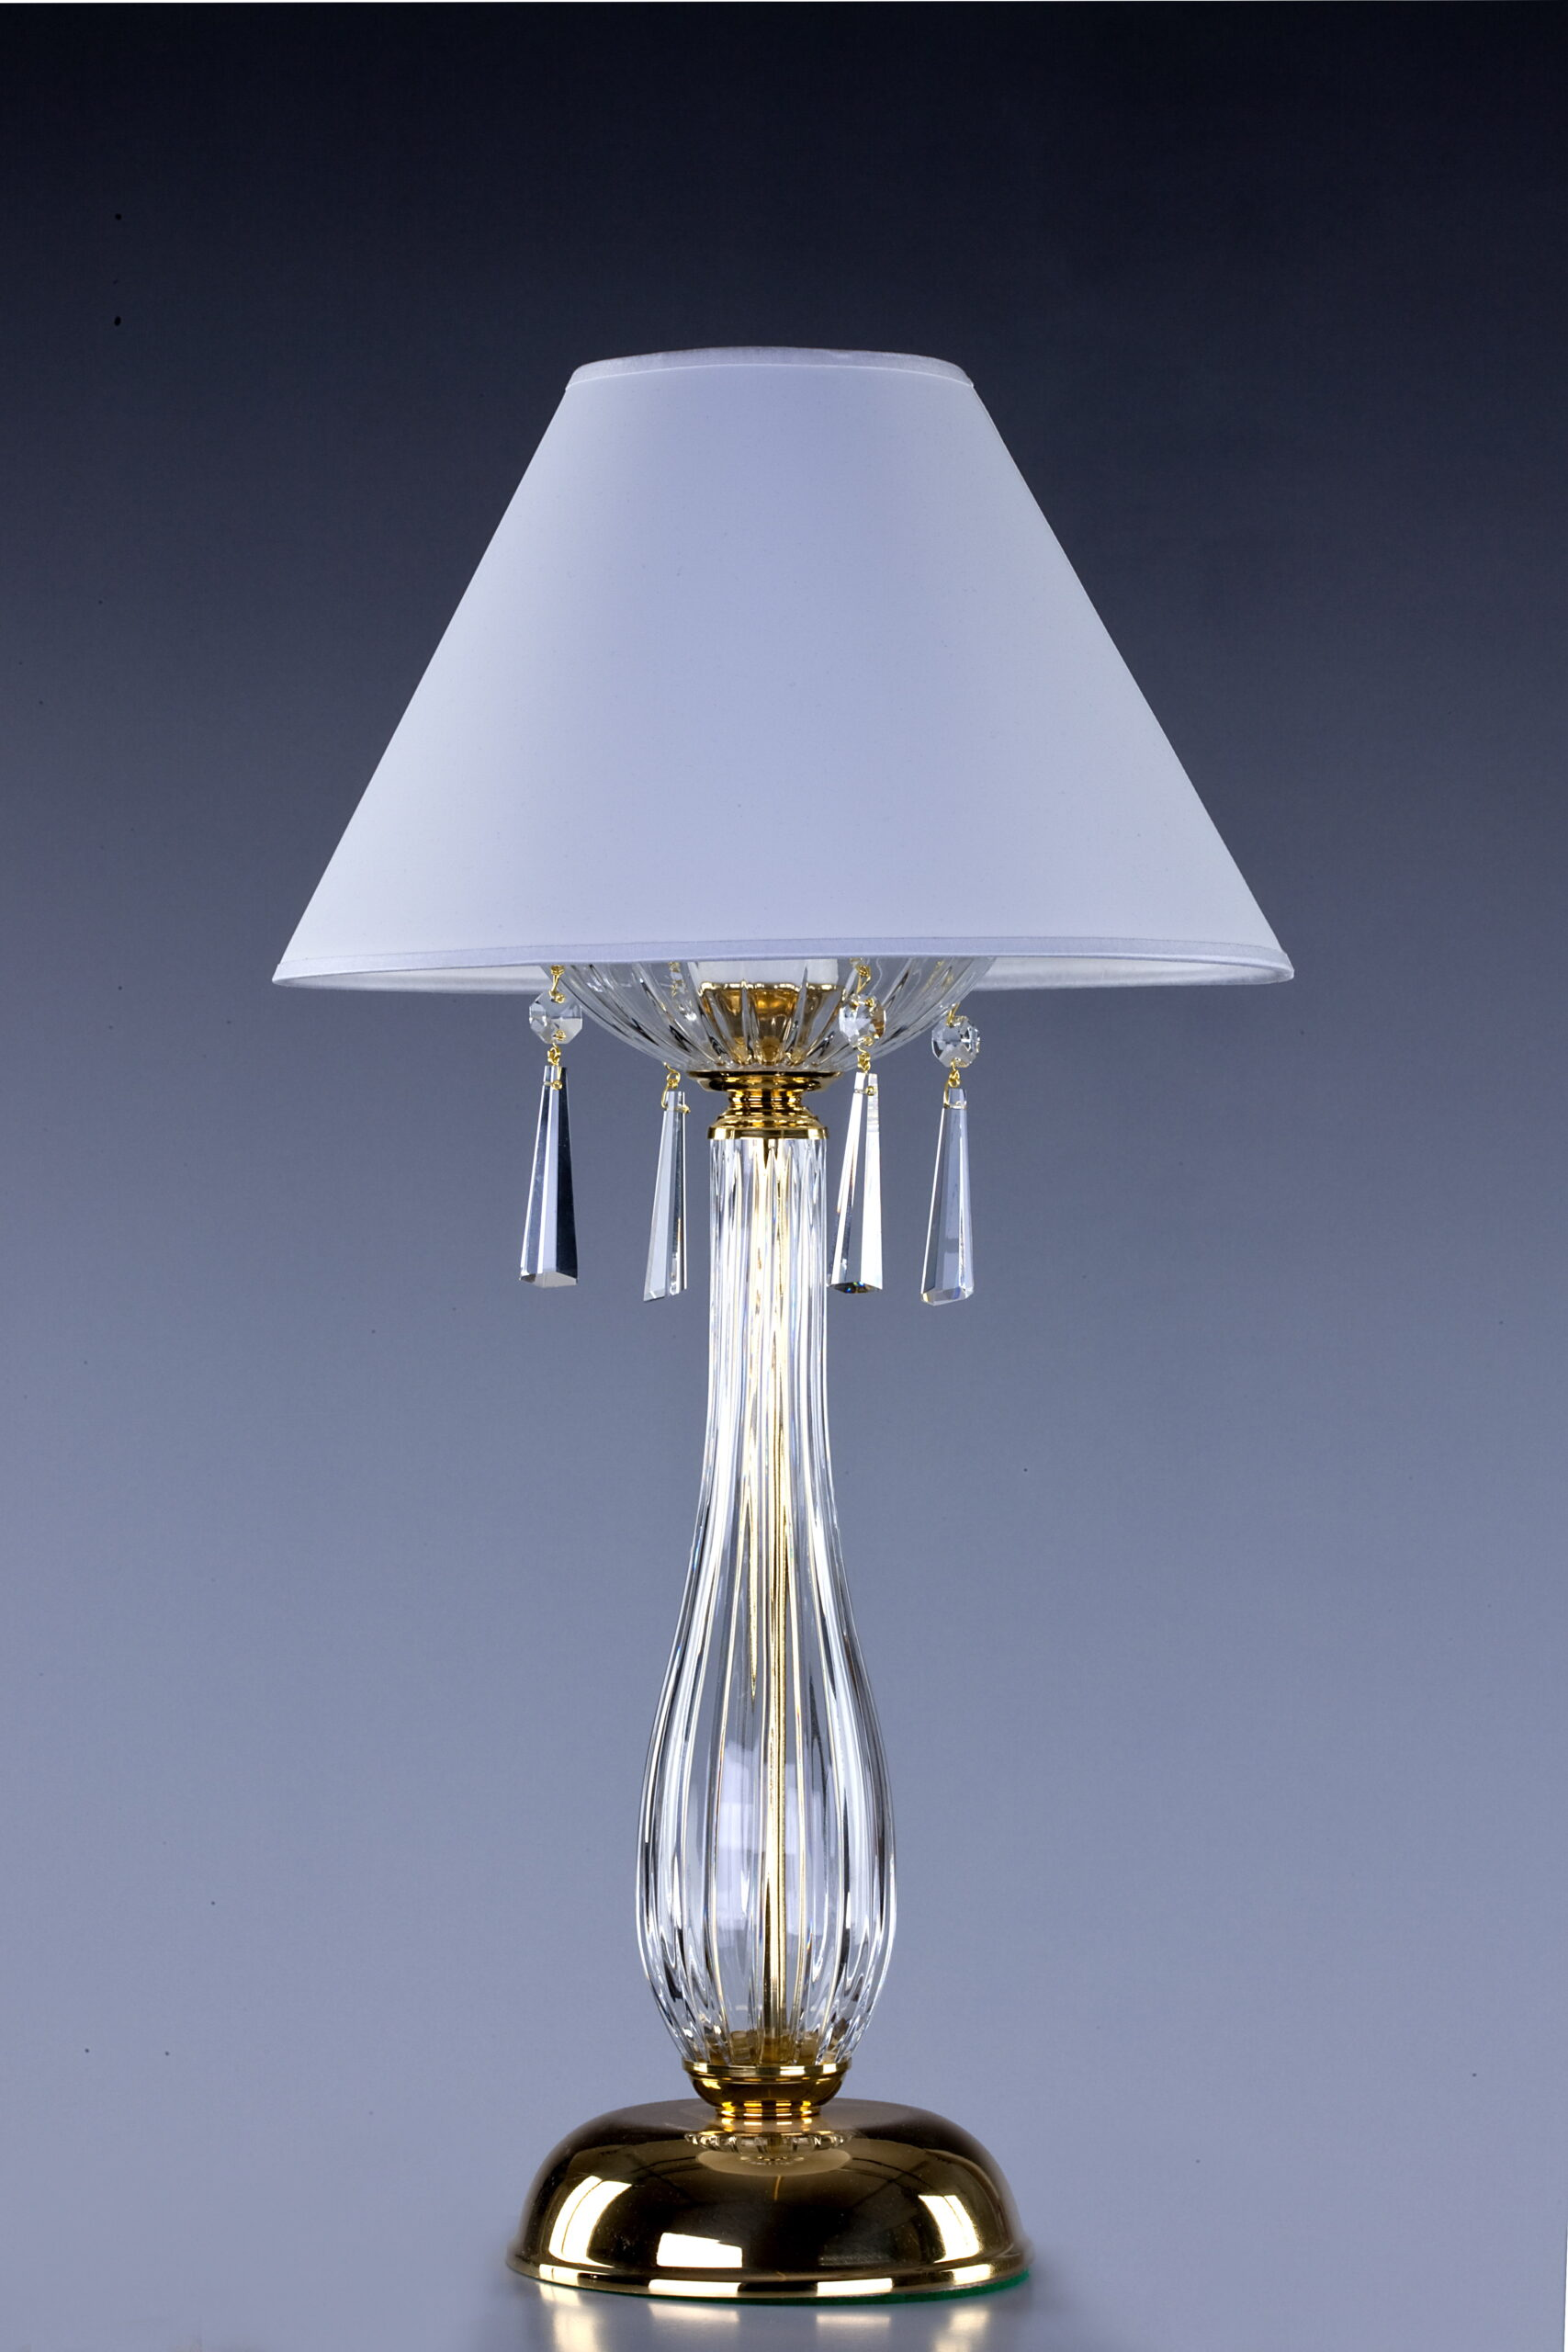 Full Size of Stehlampen Wohnzimmer Stehlampe Schlafzimmer Wohnzimmer Kristall Stehlampe